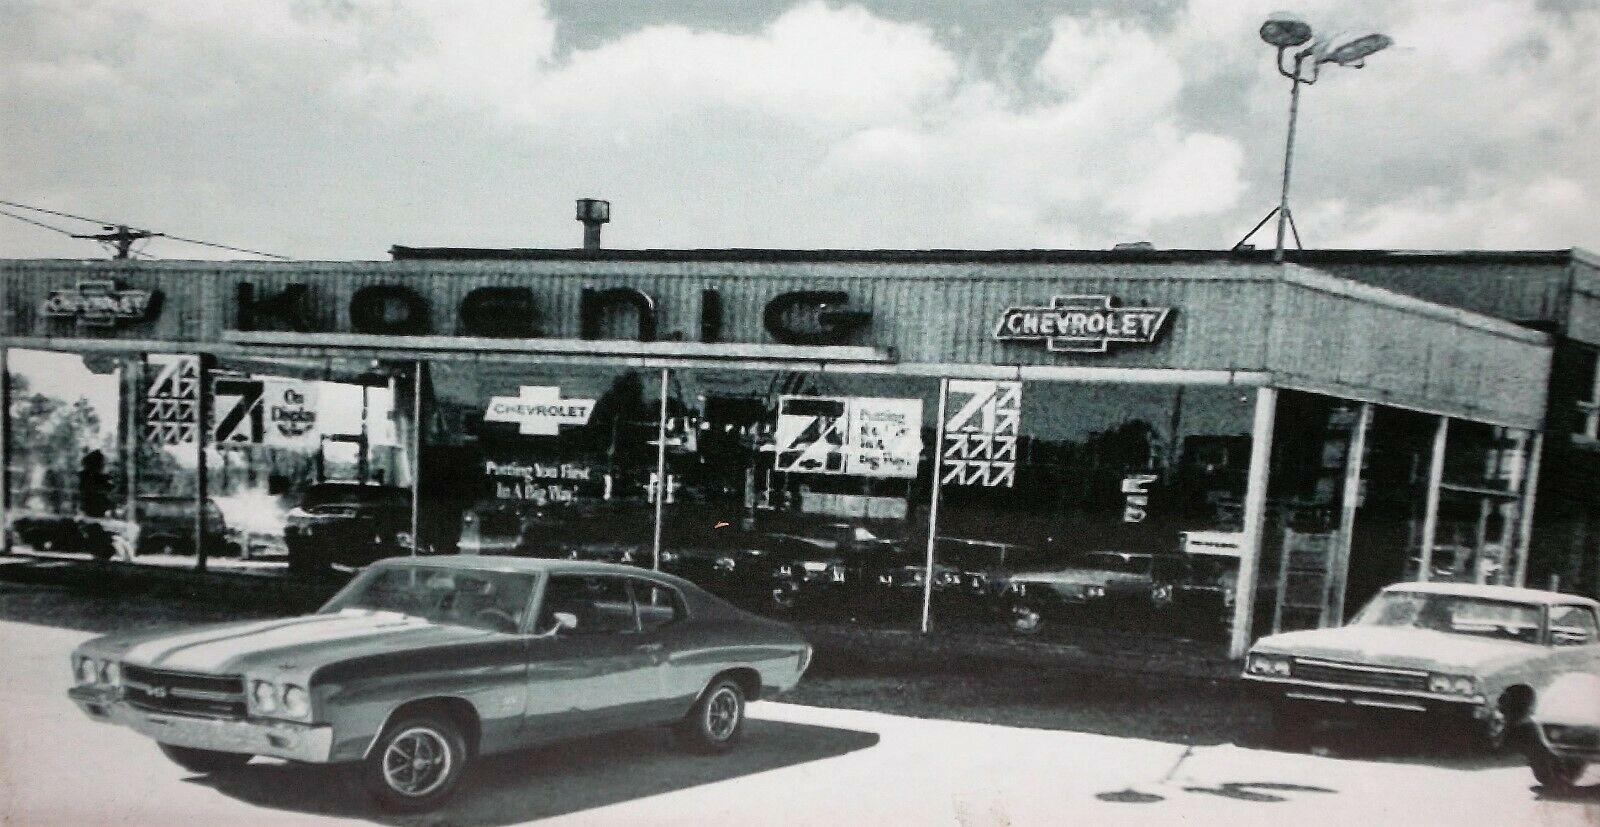 1971 Bill Koenig Chevrolet Oldsmobile Dealership Port Angeles Washington Car Dealership Plymouth Satellite Chevrolet